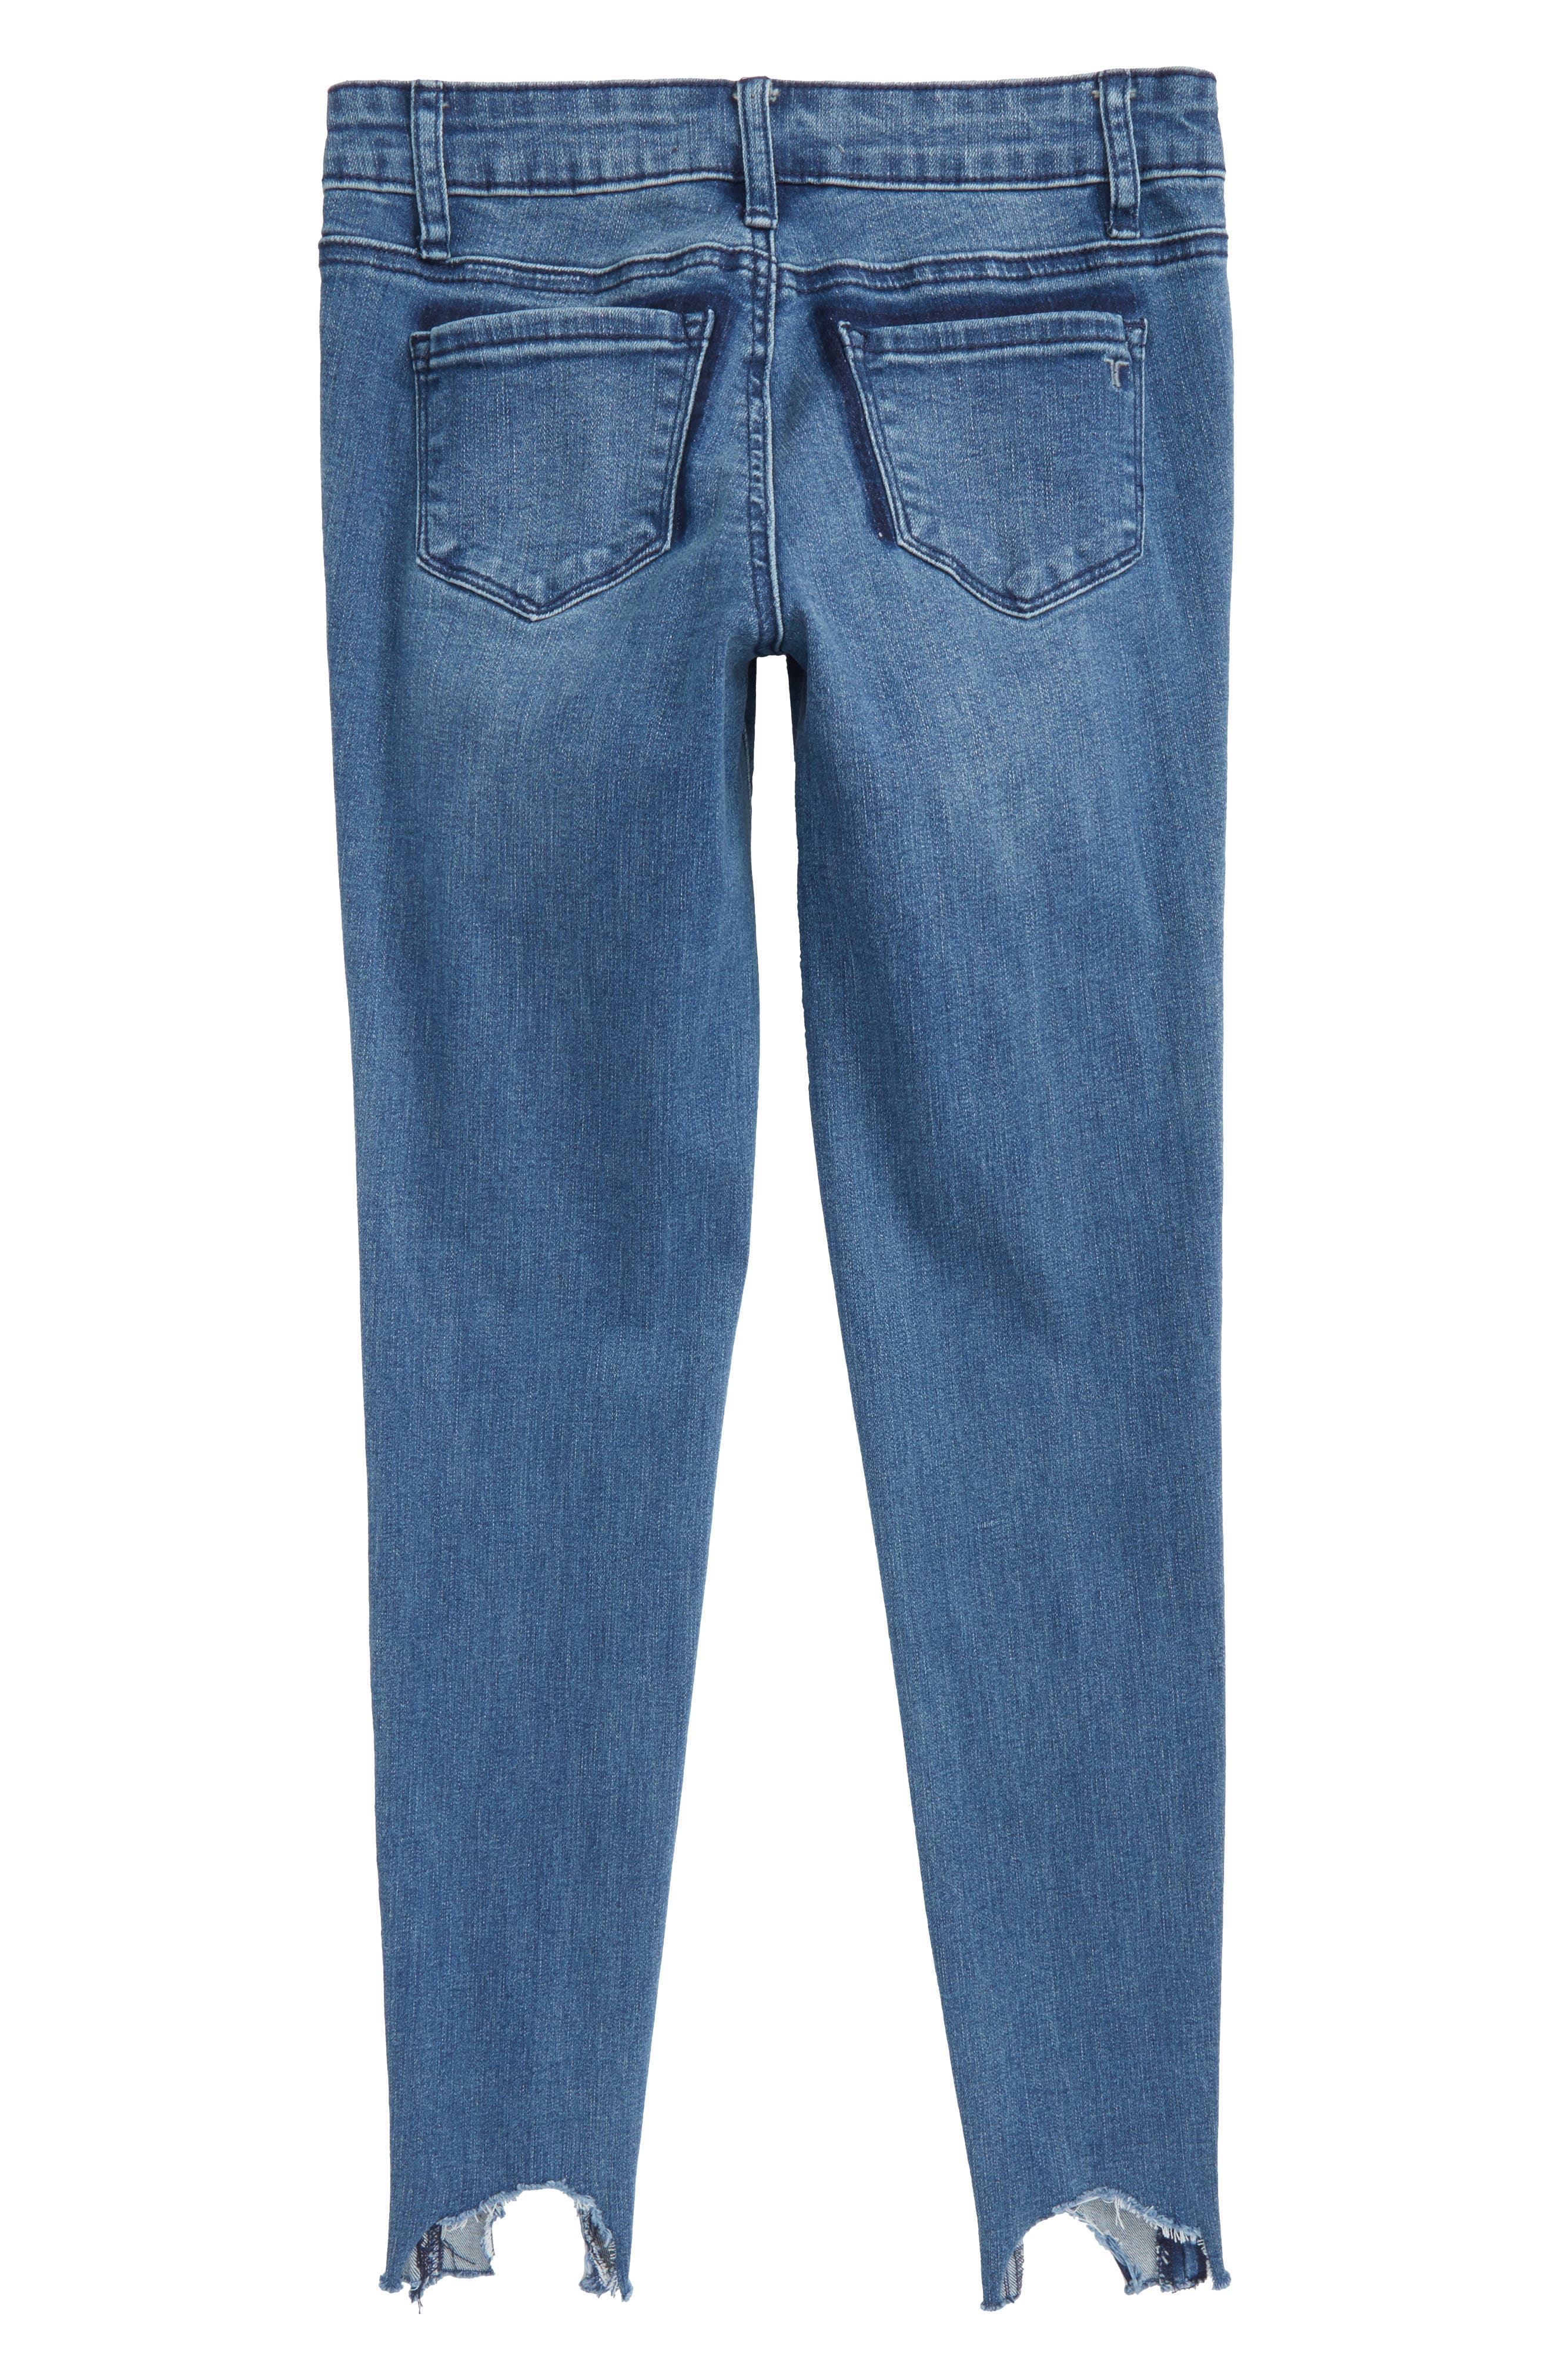 Crop Skinny Jeans,                             Alternate thumbnail 3, color,                             Indigo